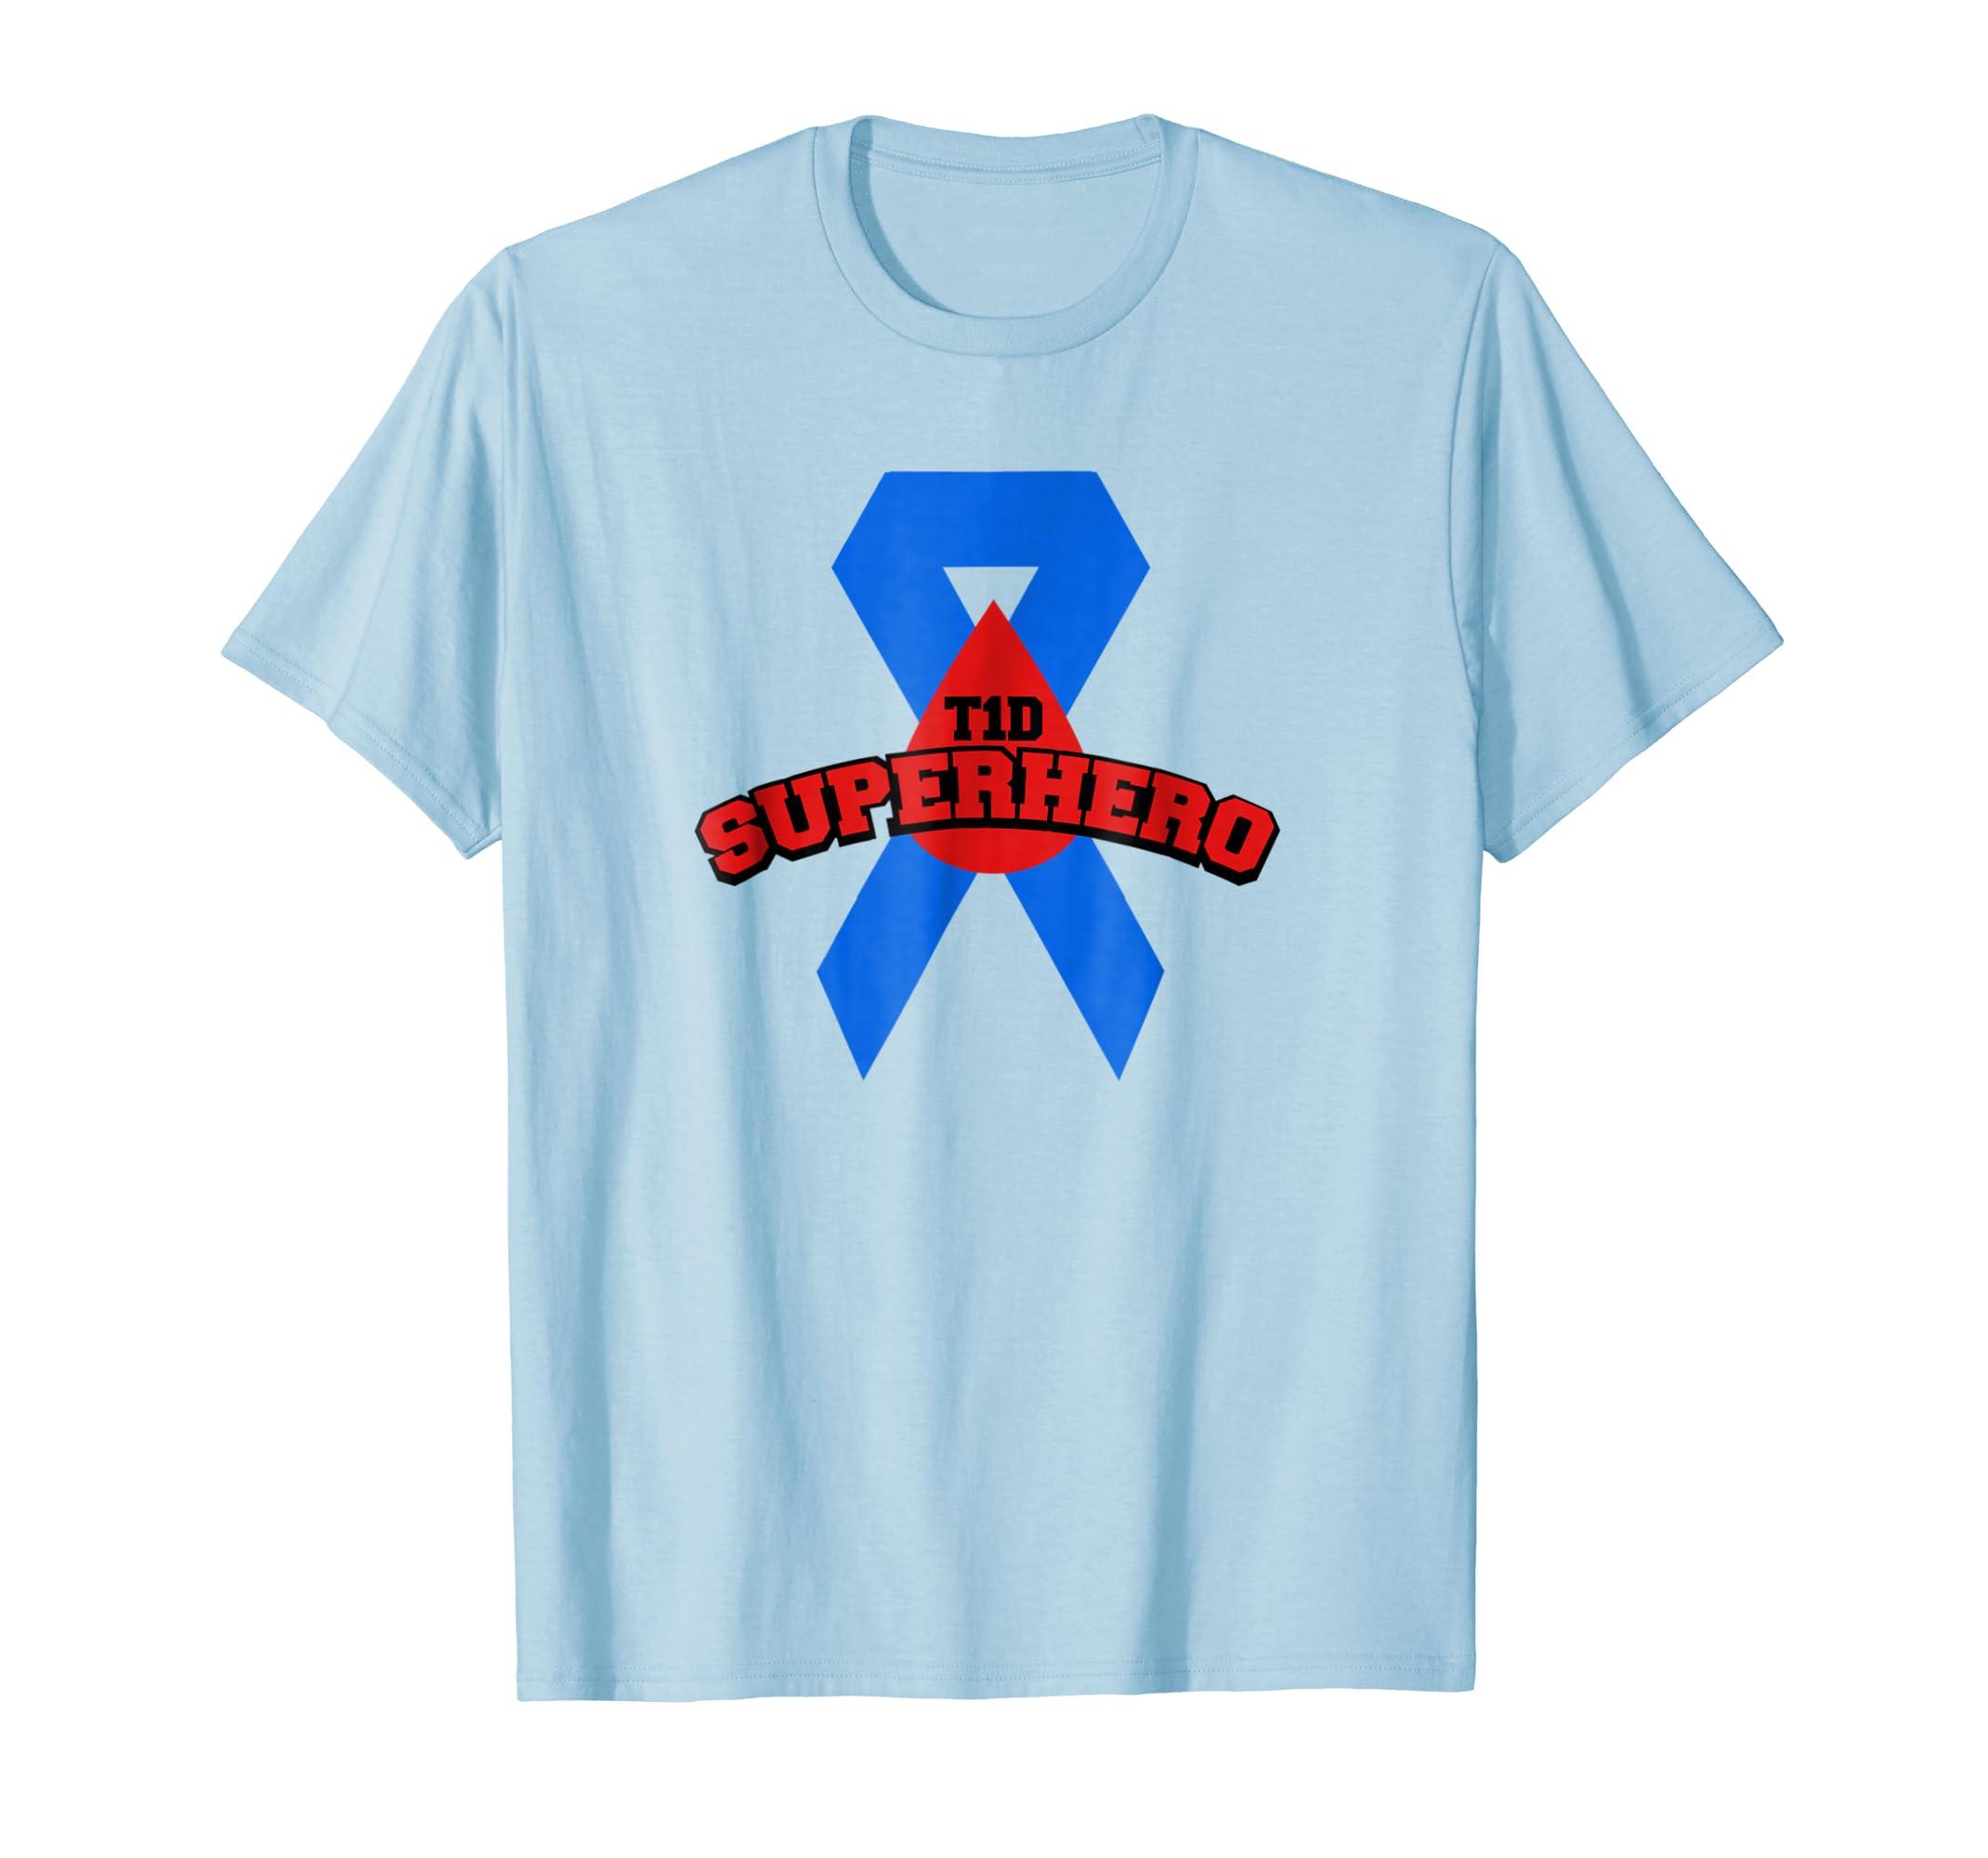 T1D Superhero type1 t1 Diabetes T Shirt Ribbon for Men Women-azvn